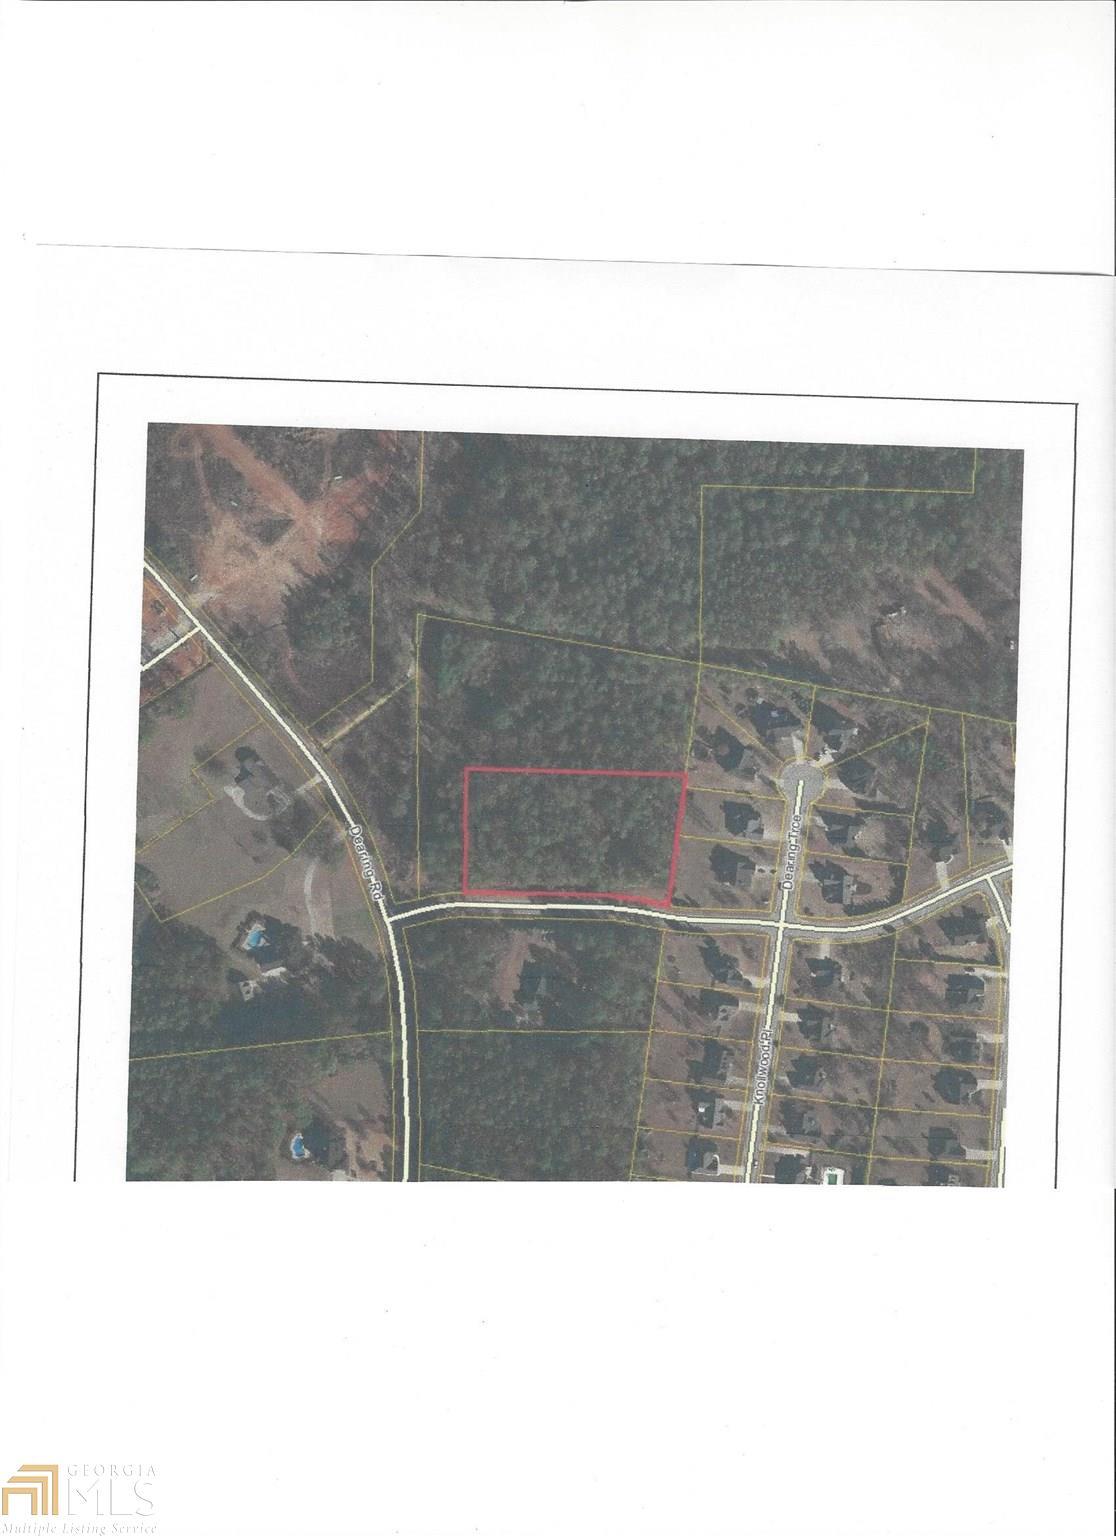 0 Dearing Woods Way #2.73 ACRES, Covington, GA 30014